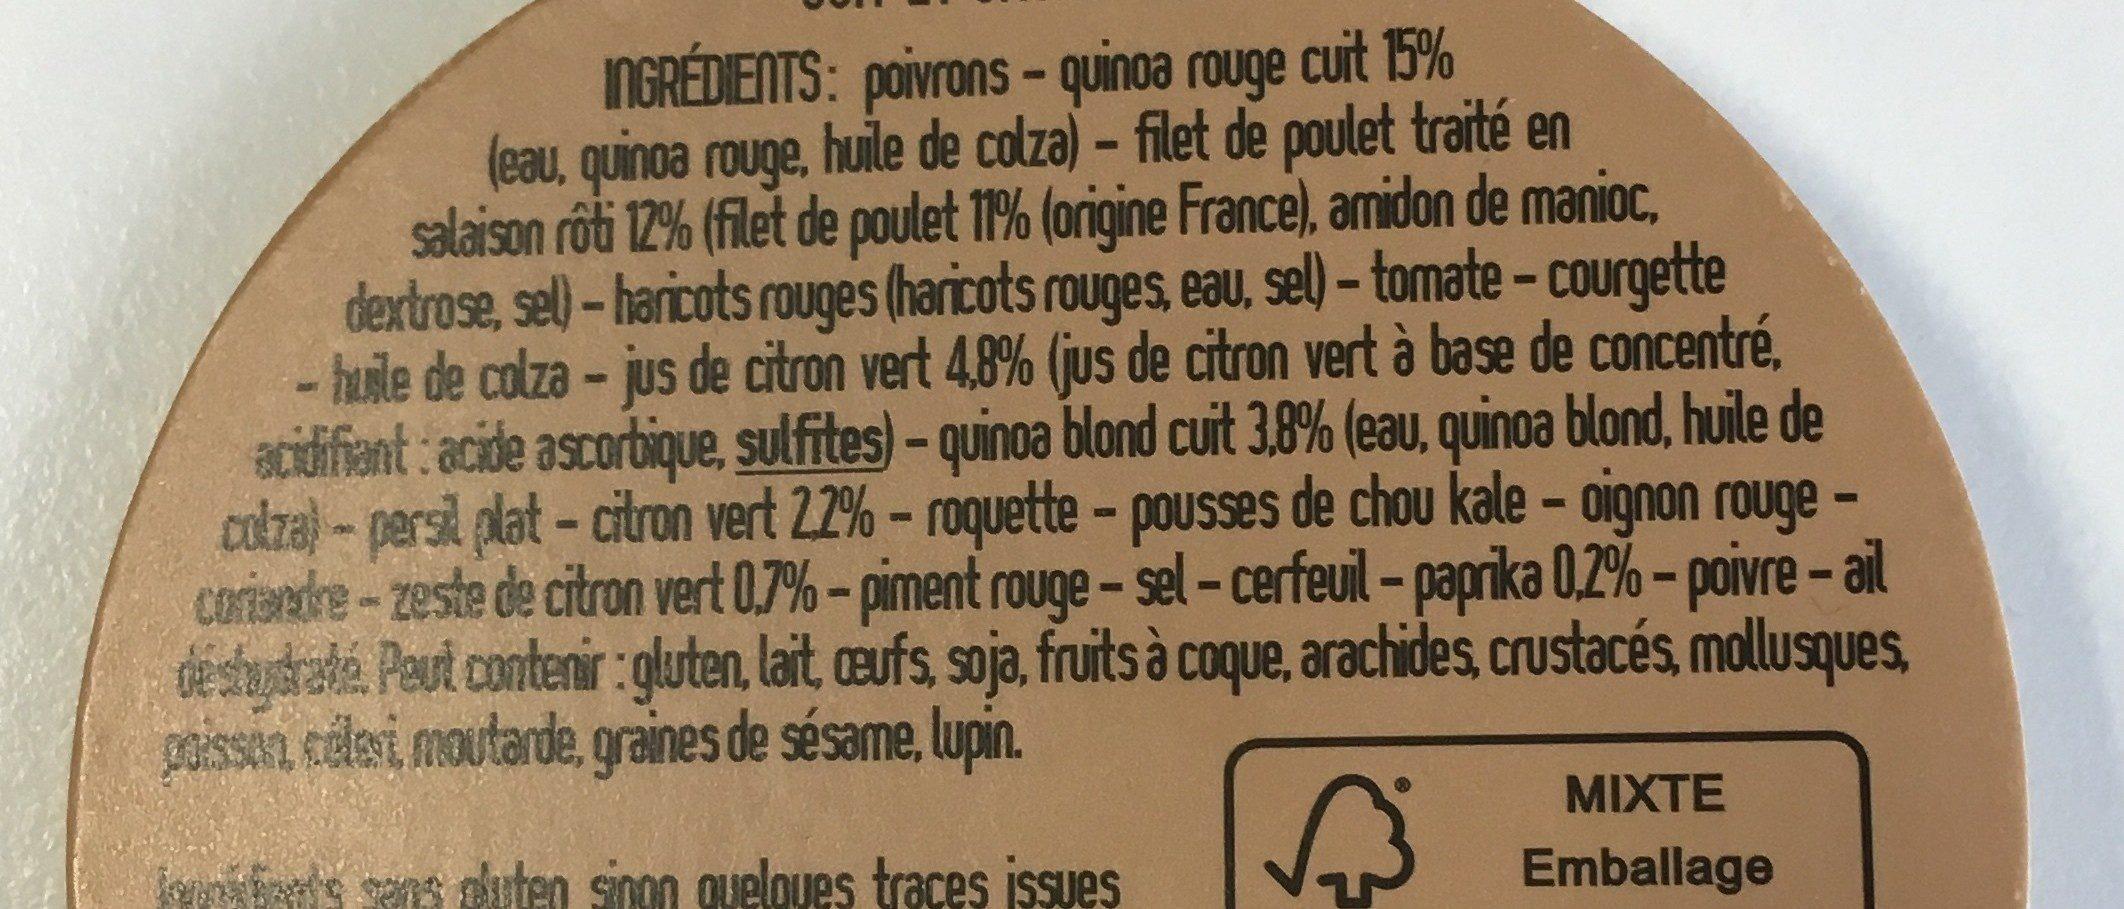 Salade poulet paprika quinoa - Ingrediënten